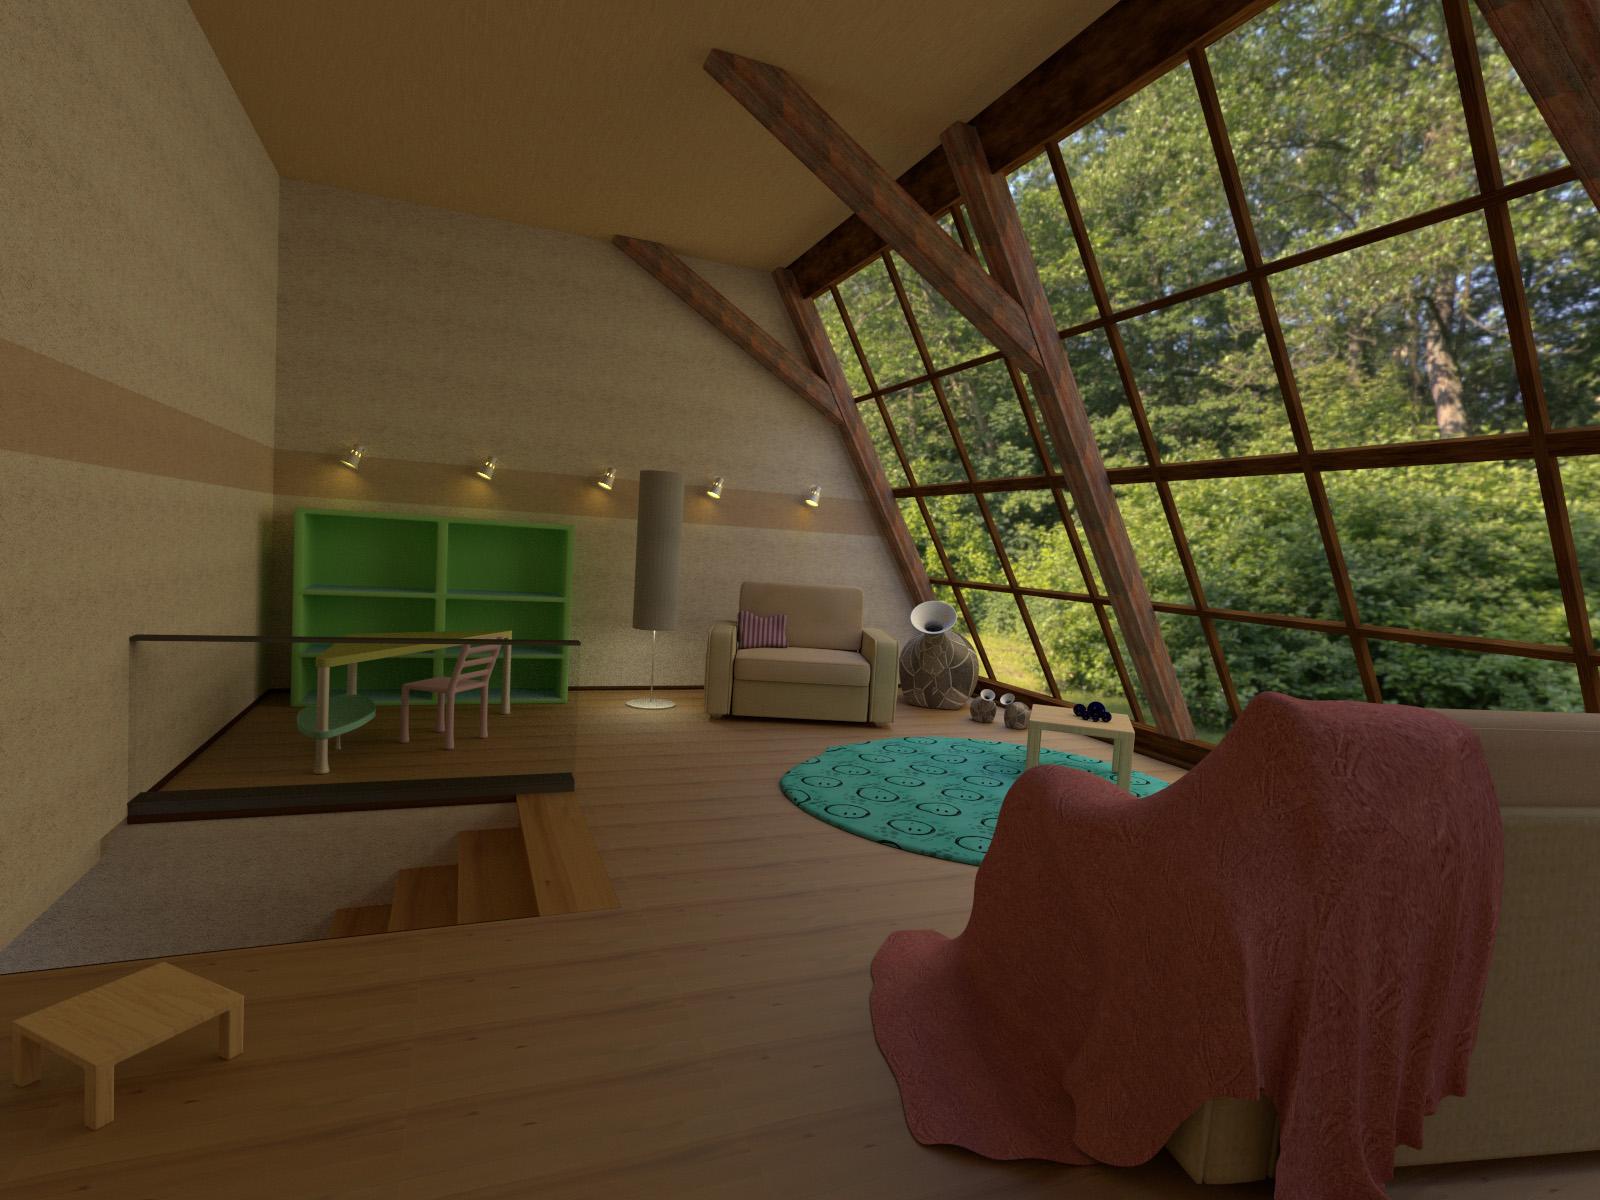 Room Scene 6